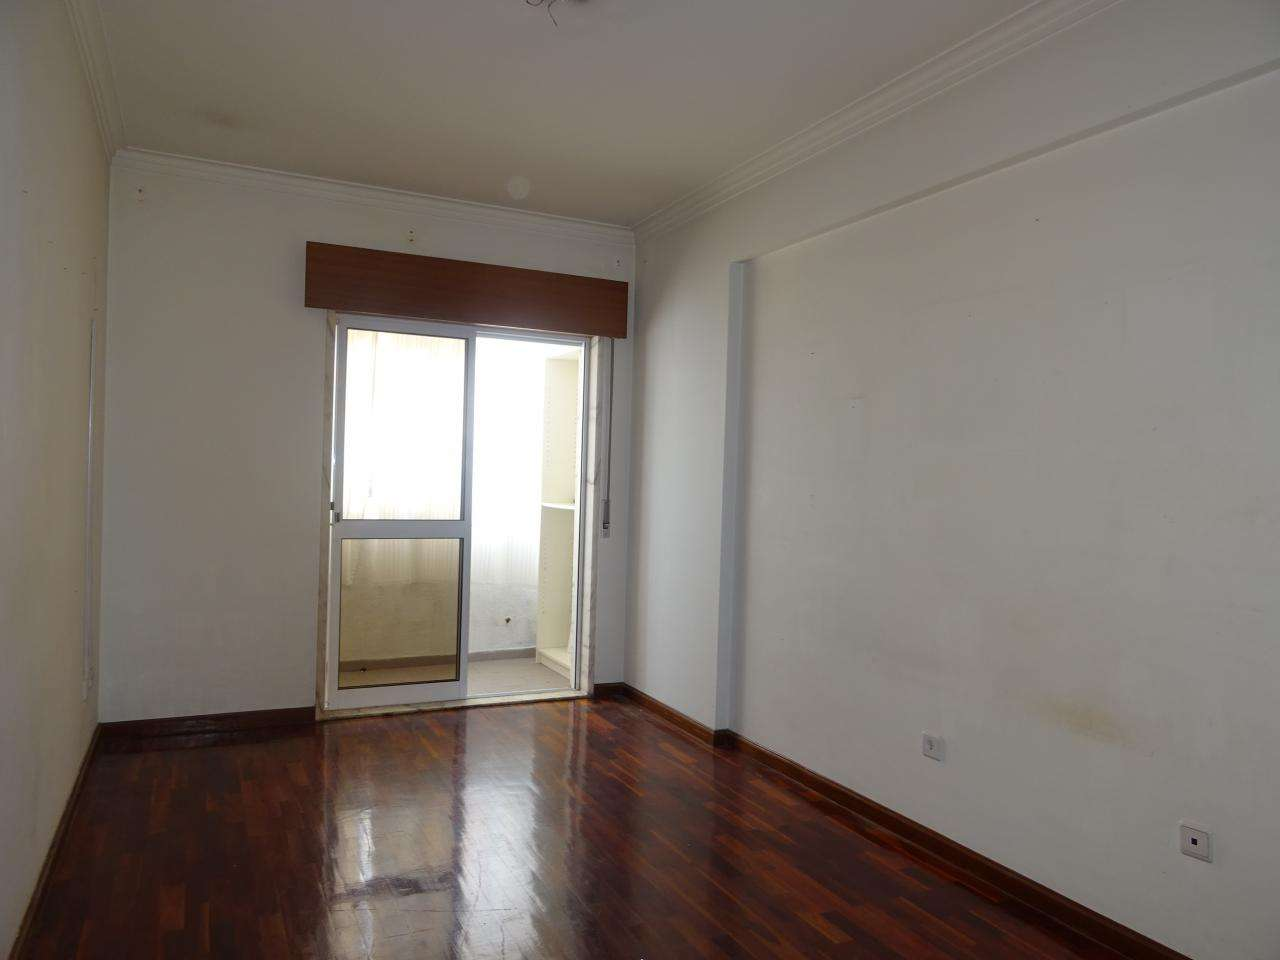 Apartamento para comprar, Porto Salvo, Oeiras, Lisboa - Foto 8